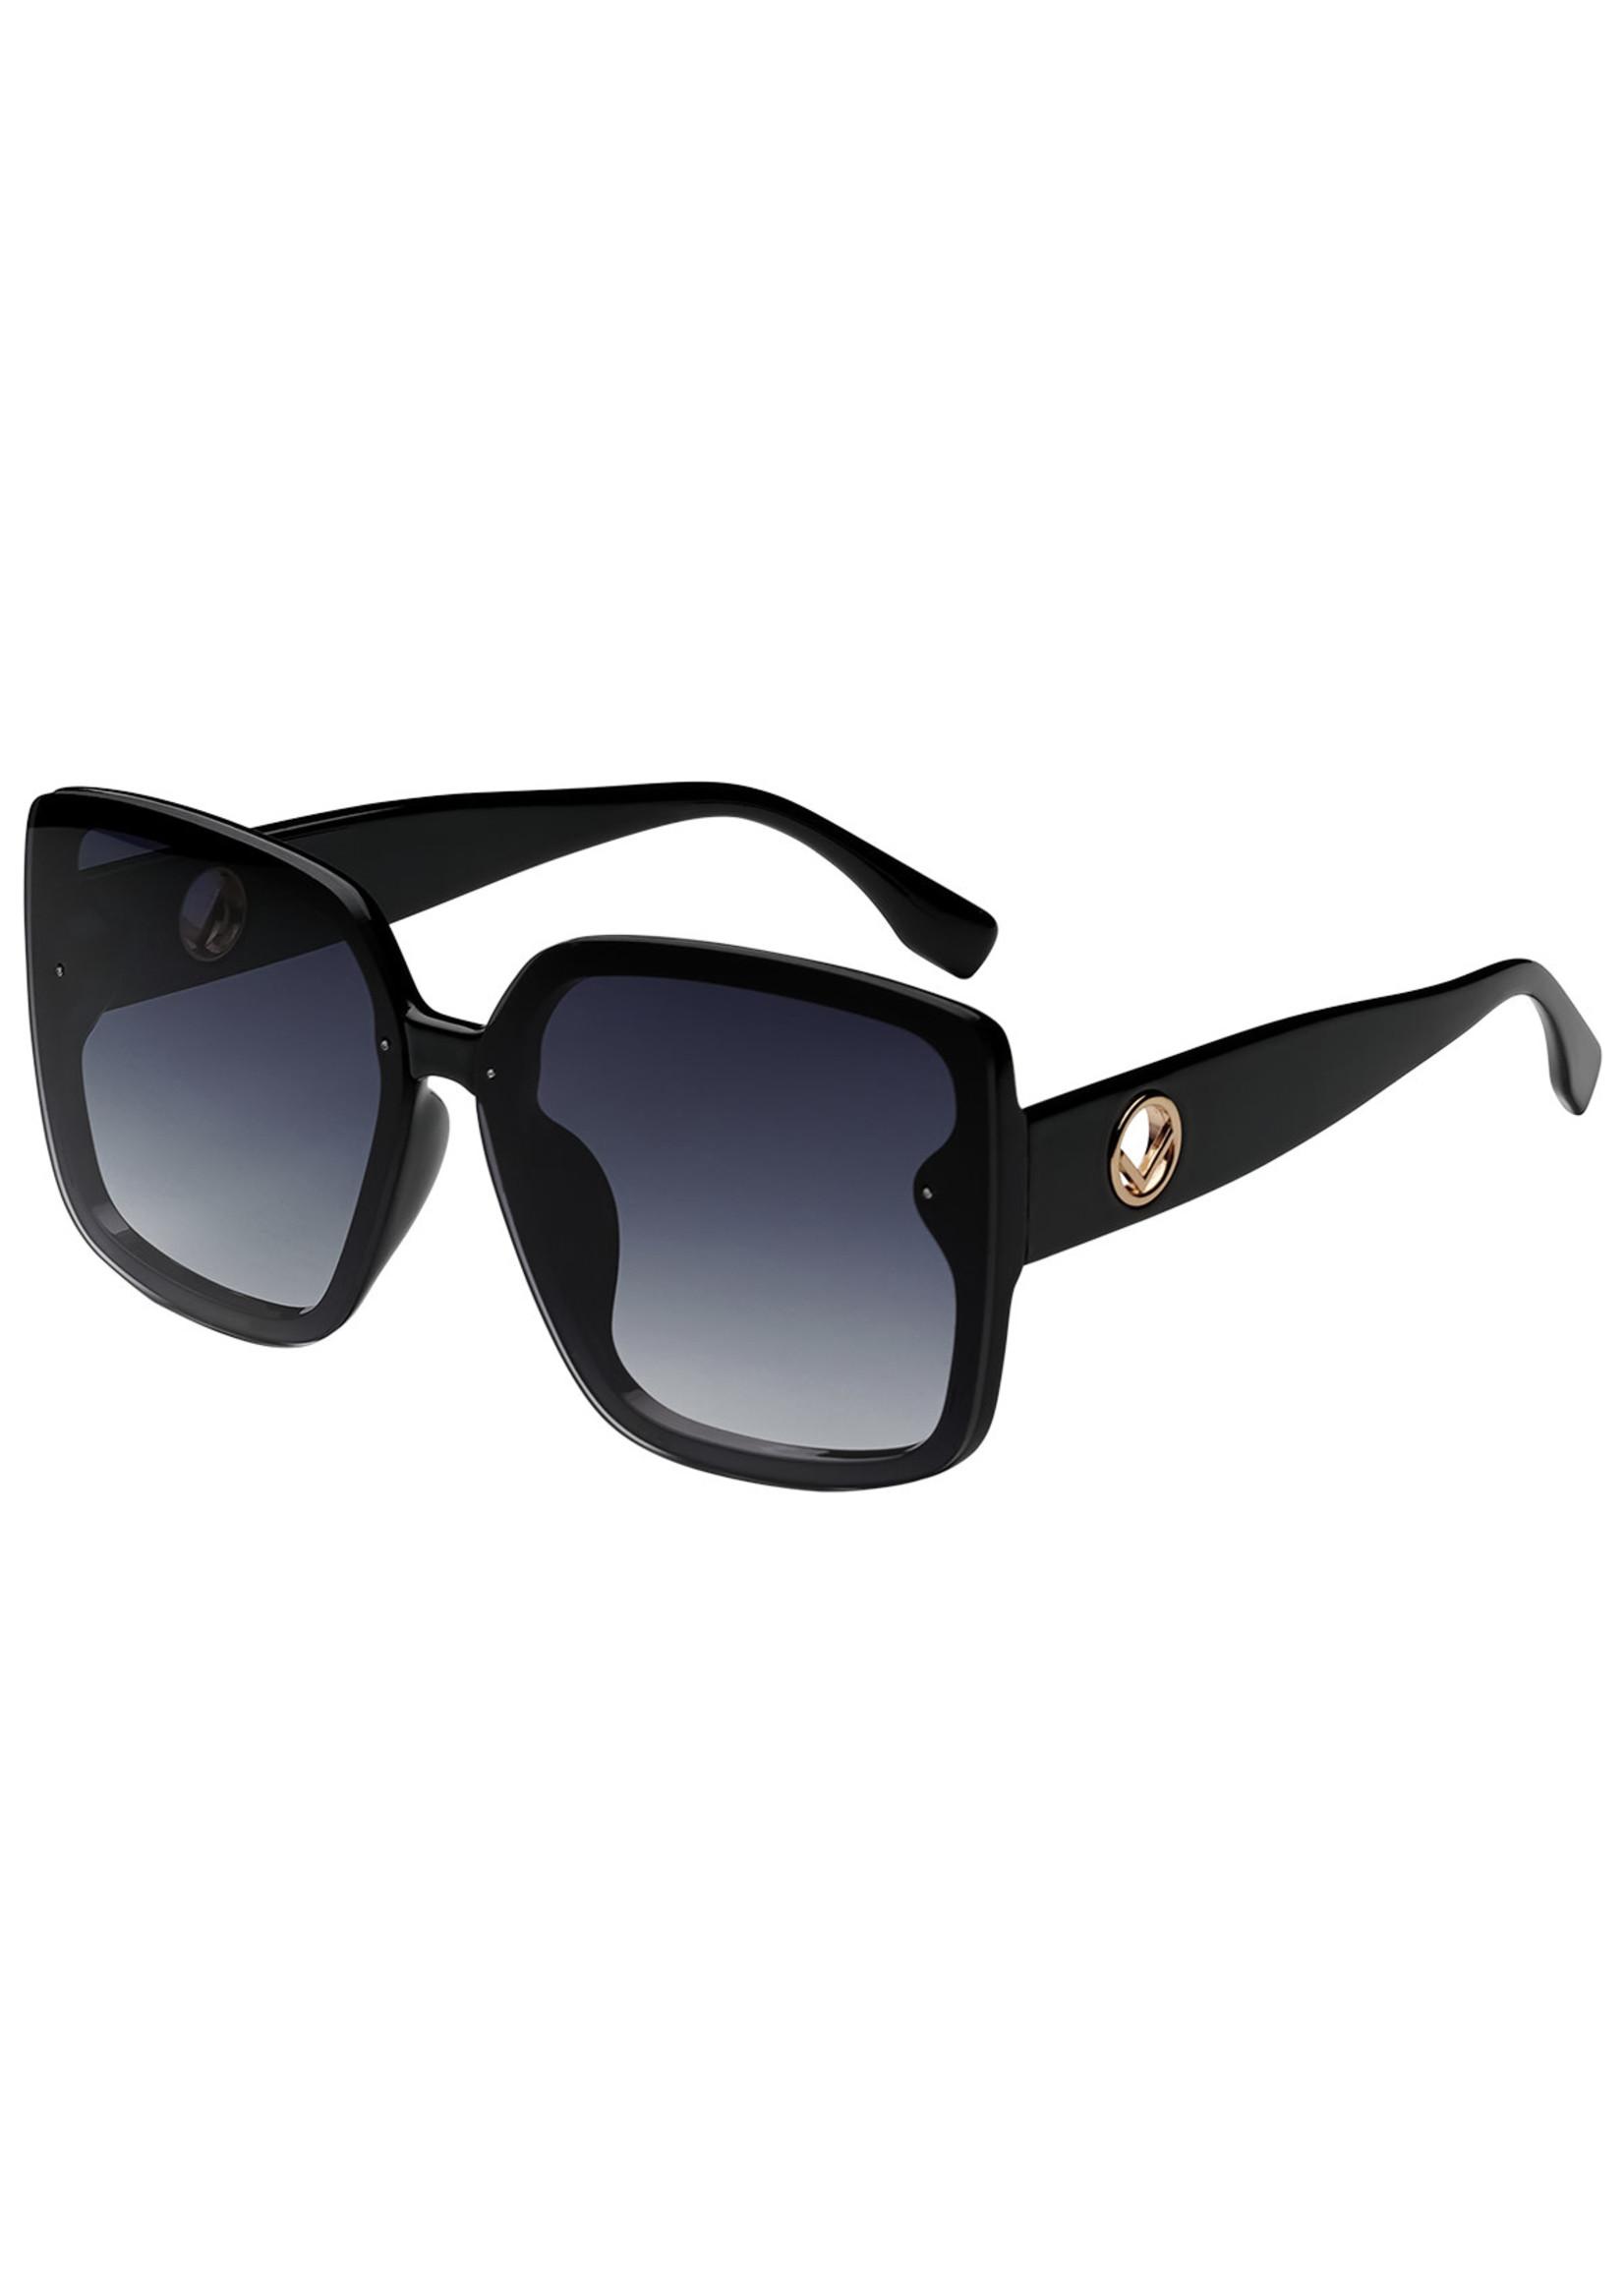 Ladybugs Vierkante zonnebril zwart